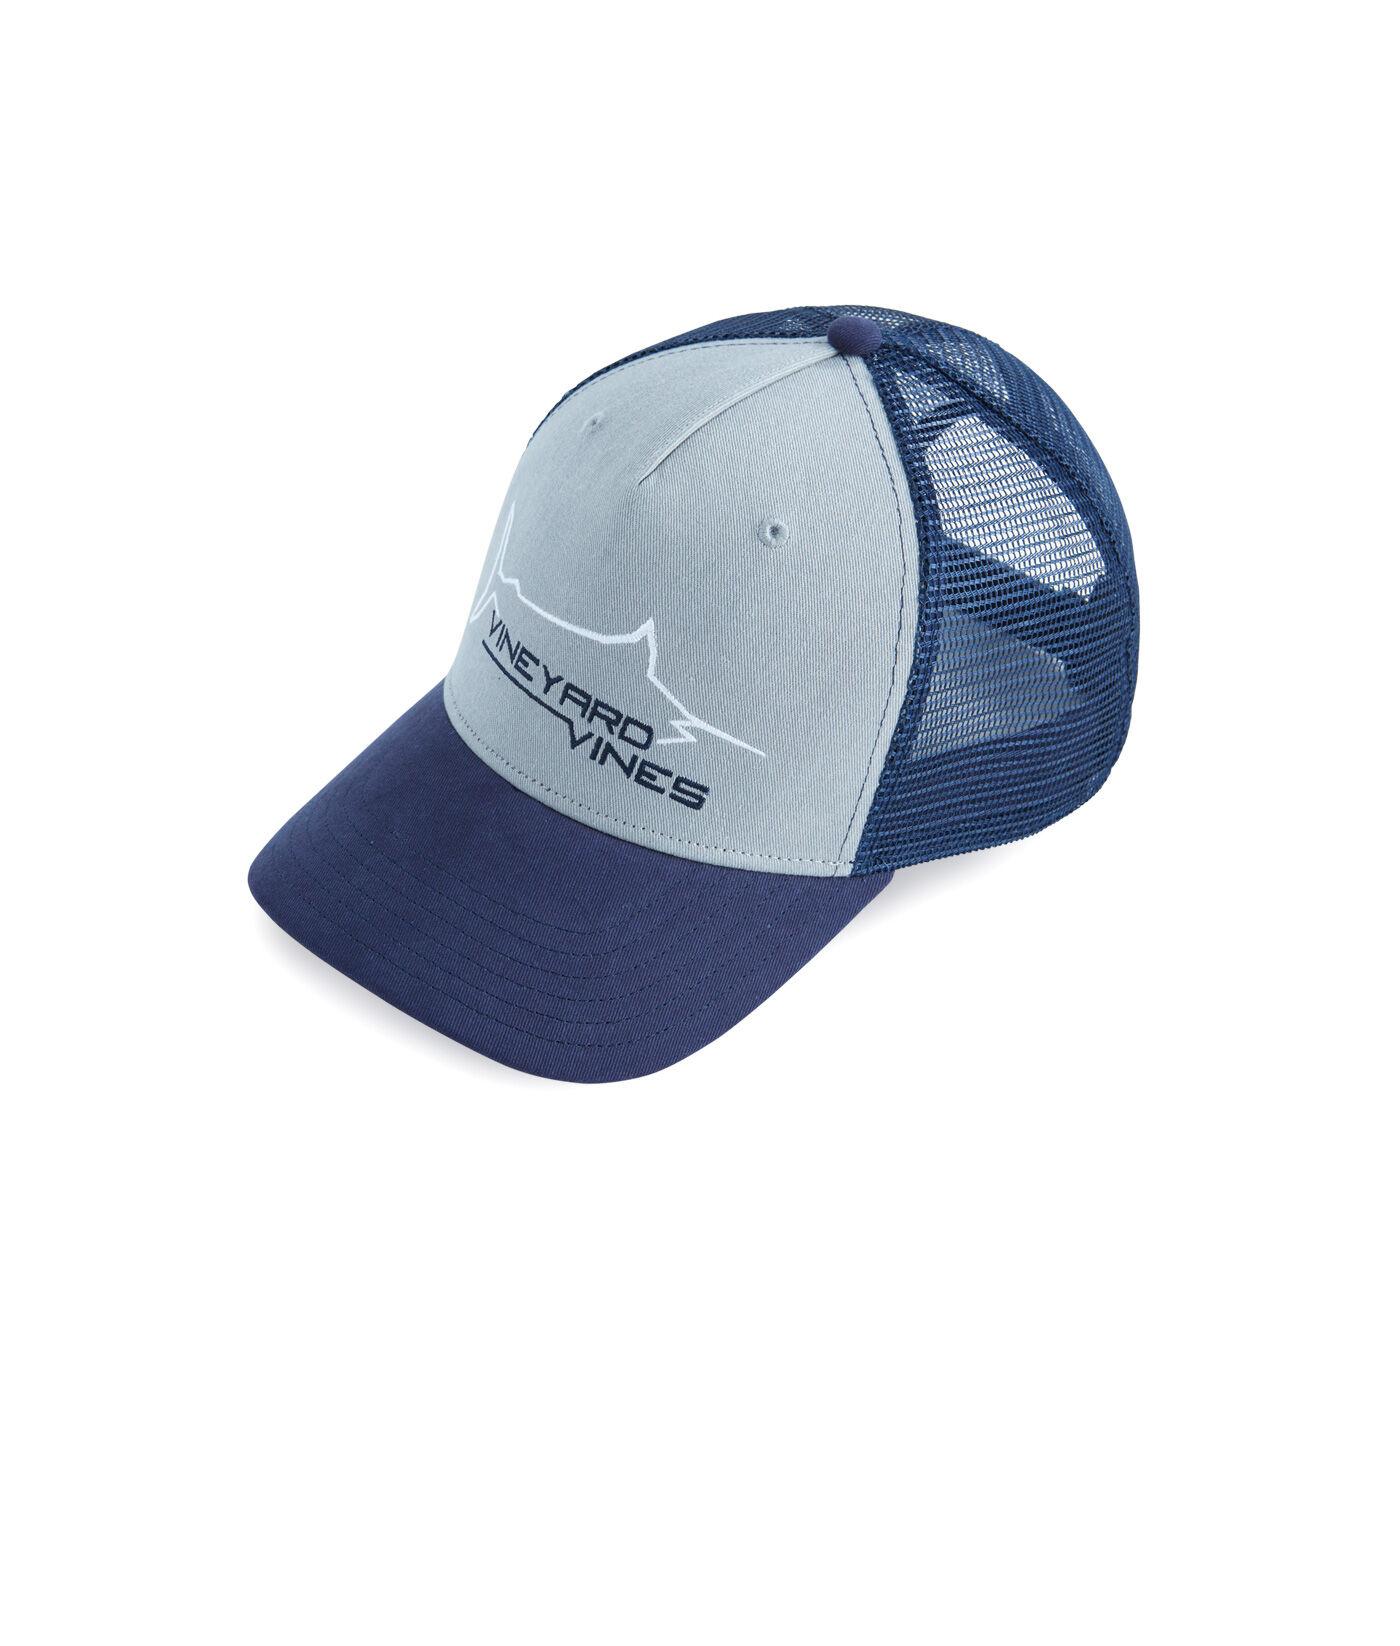 468d42310c976 czech costa del mar rip tide trucker hat black white ha 36n c43ec 70a2c   spain high profile marlin patch trucker hat 35ff5 f99da